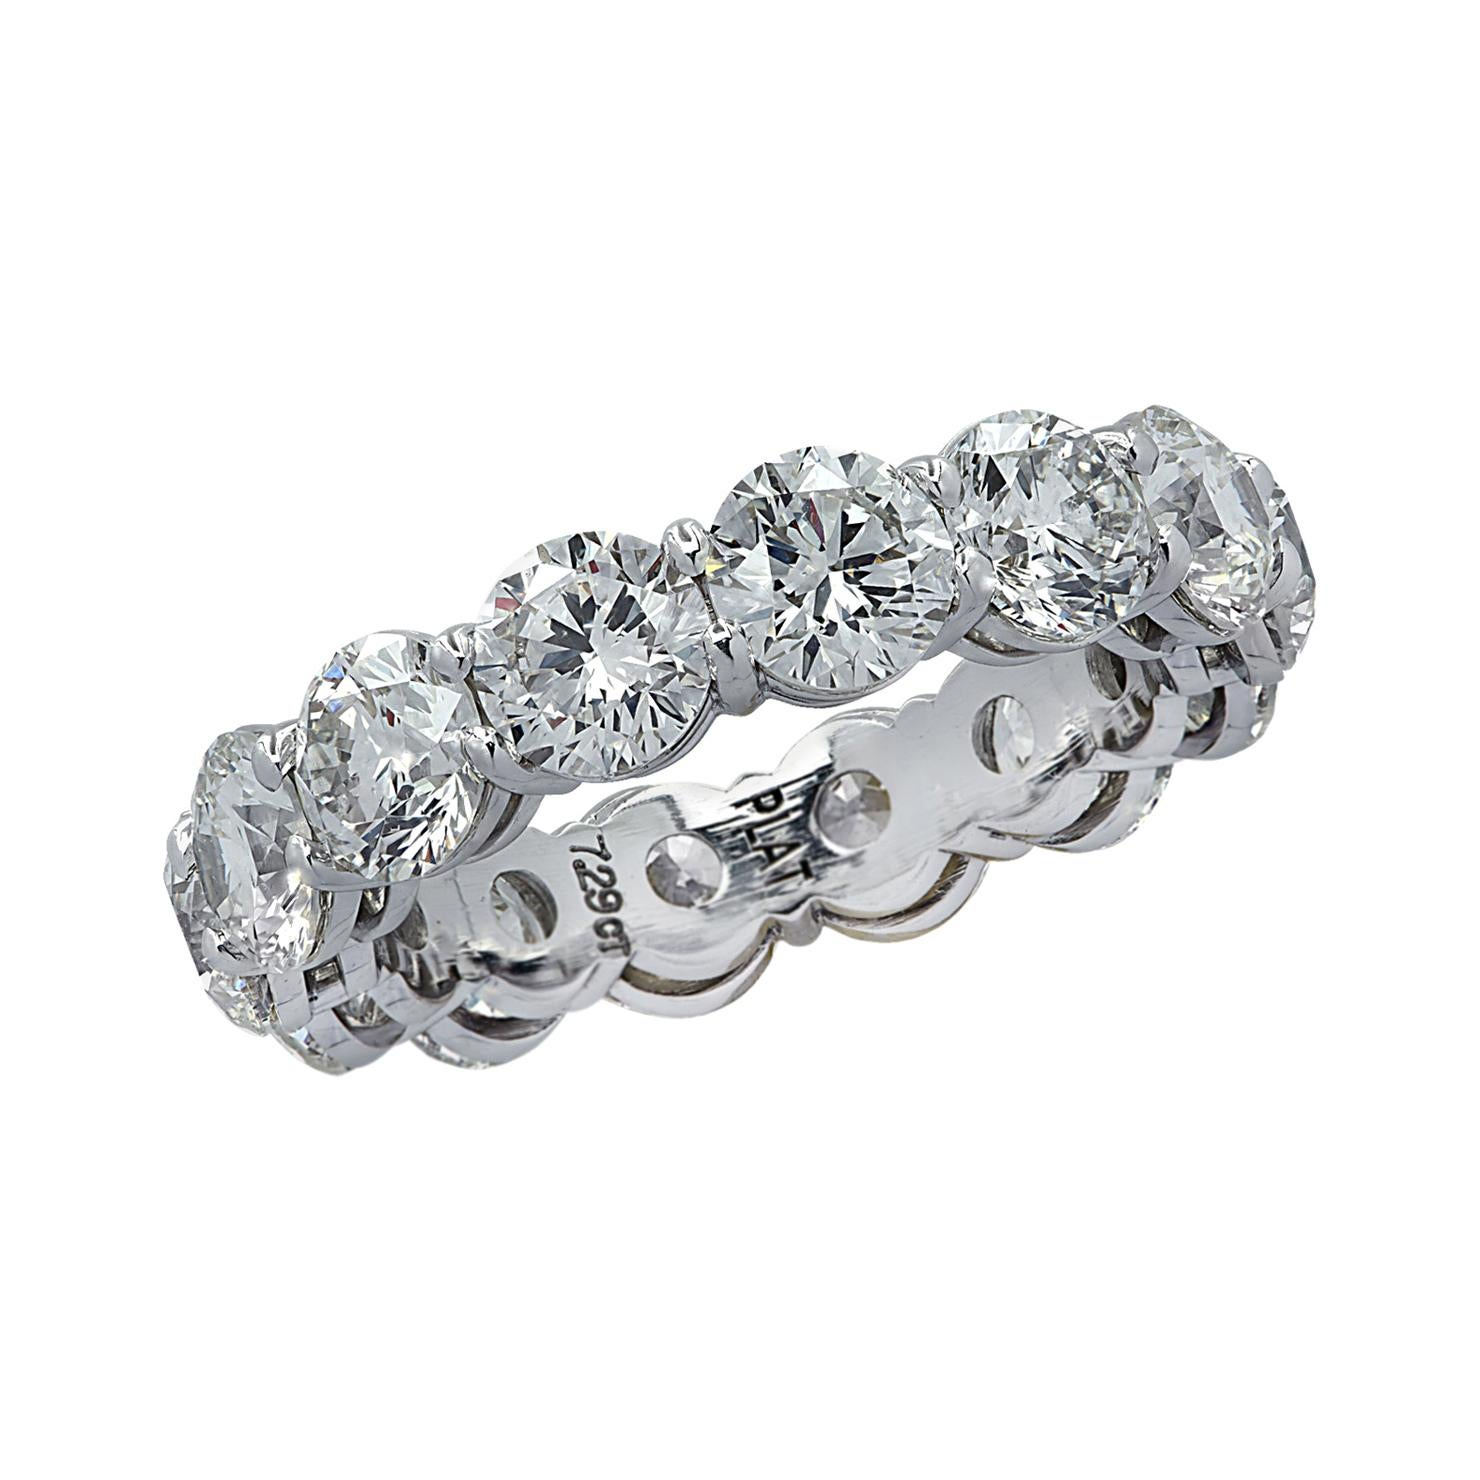 Vivid Diamonds 7.29 Carat Diamond Eternity Band